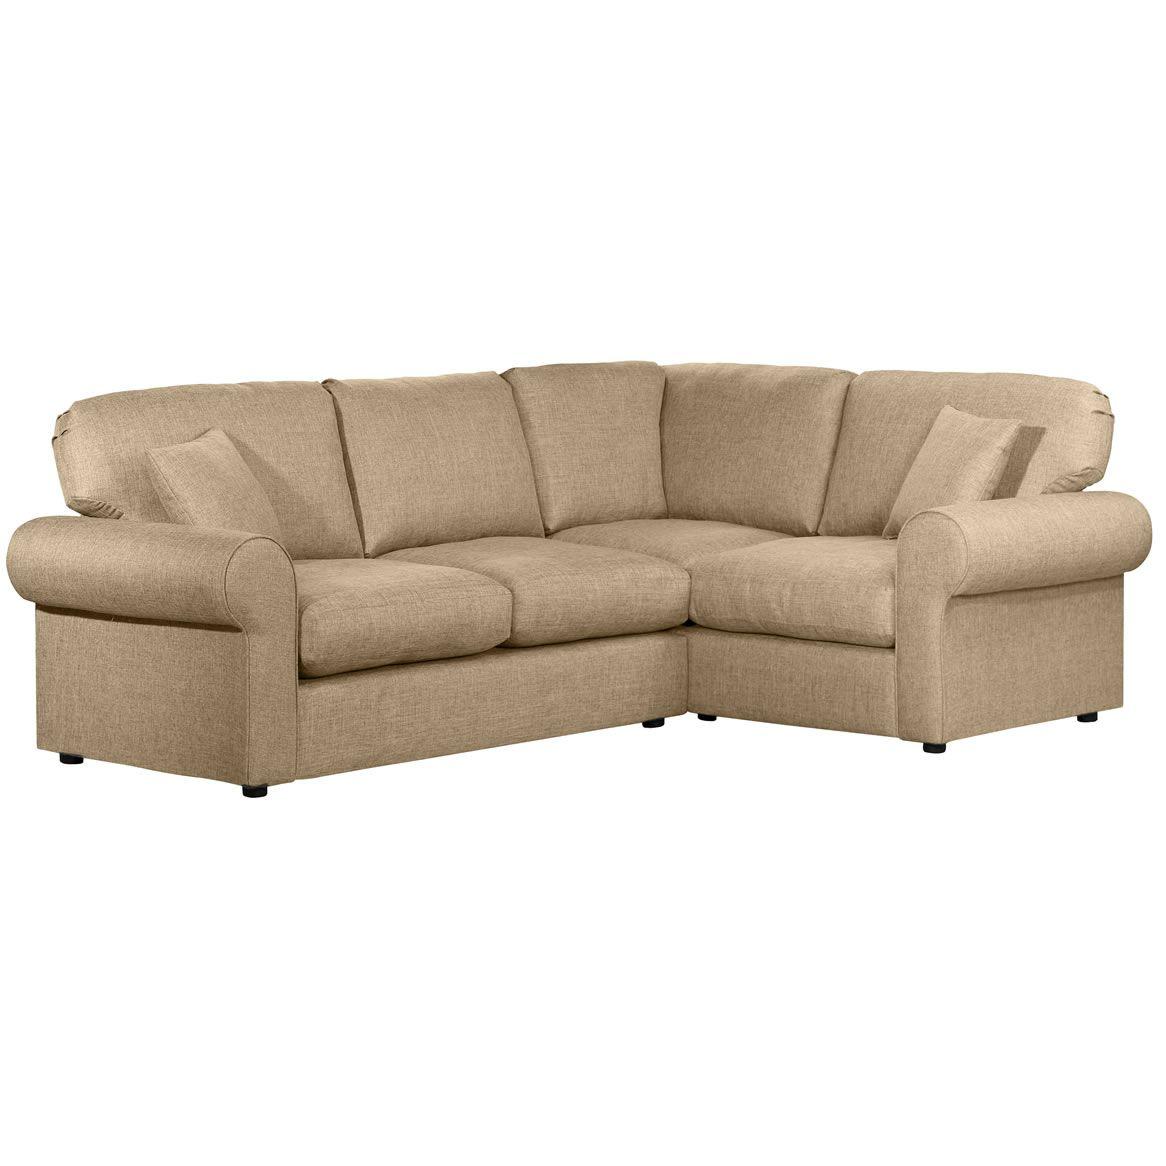 cheap corner sofas sofa bits pinterest sofas ps and. Black Bedroom Furniture Sets. Home Design Ideas